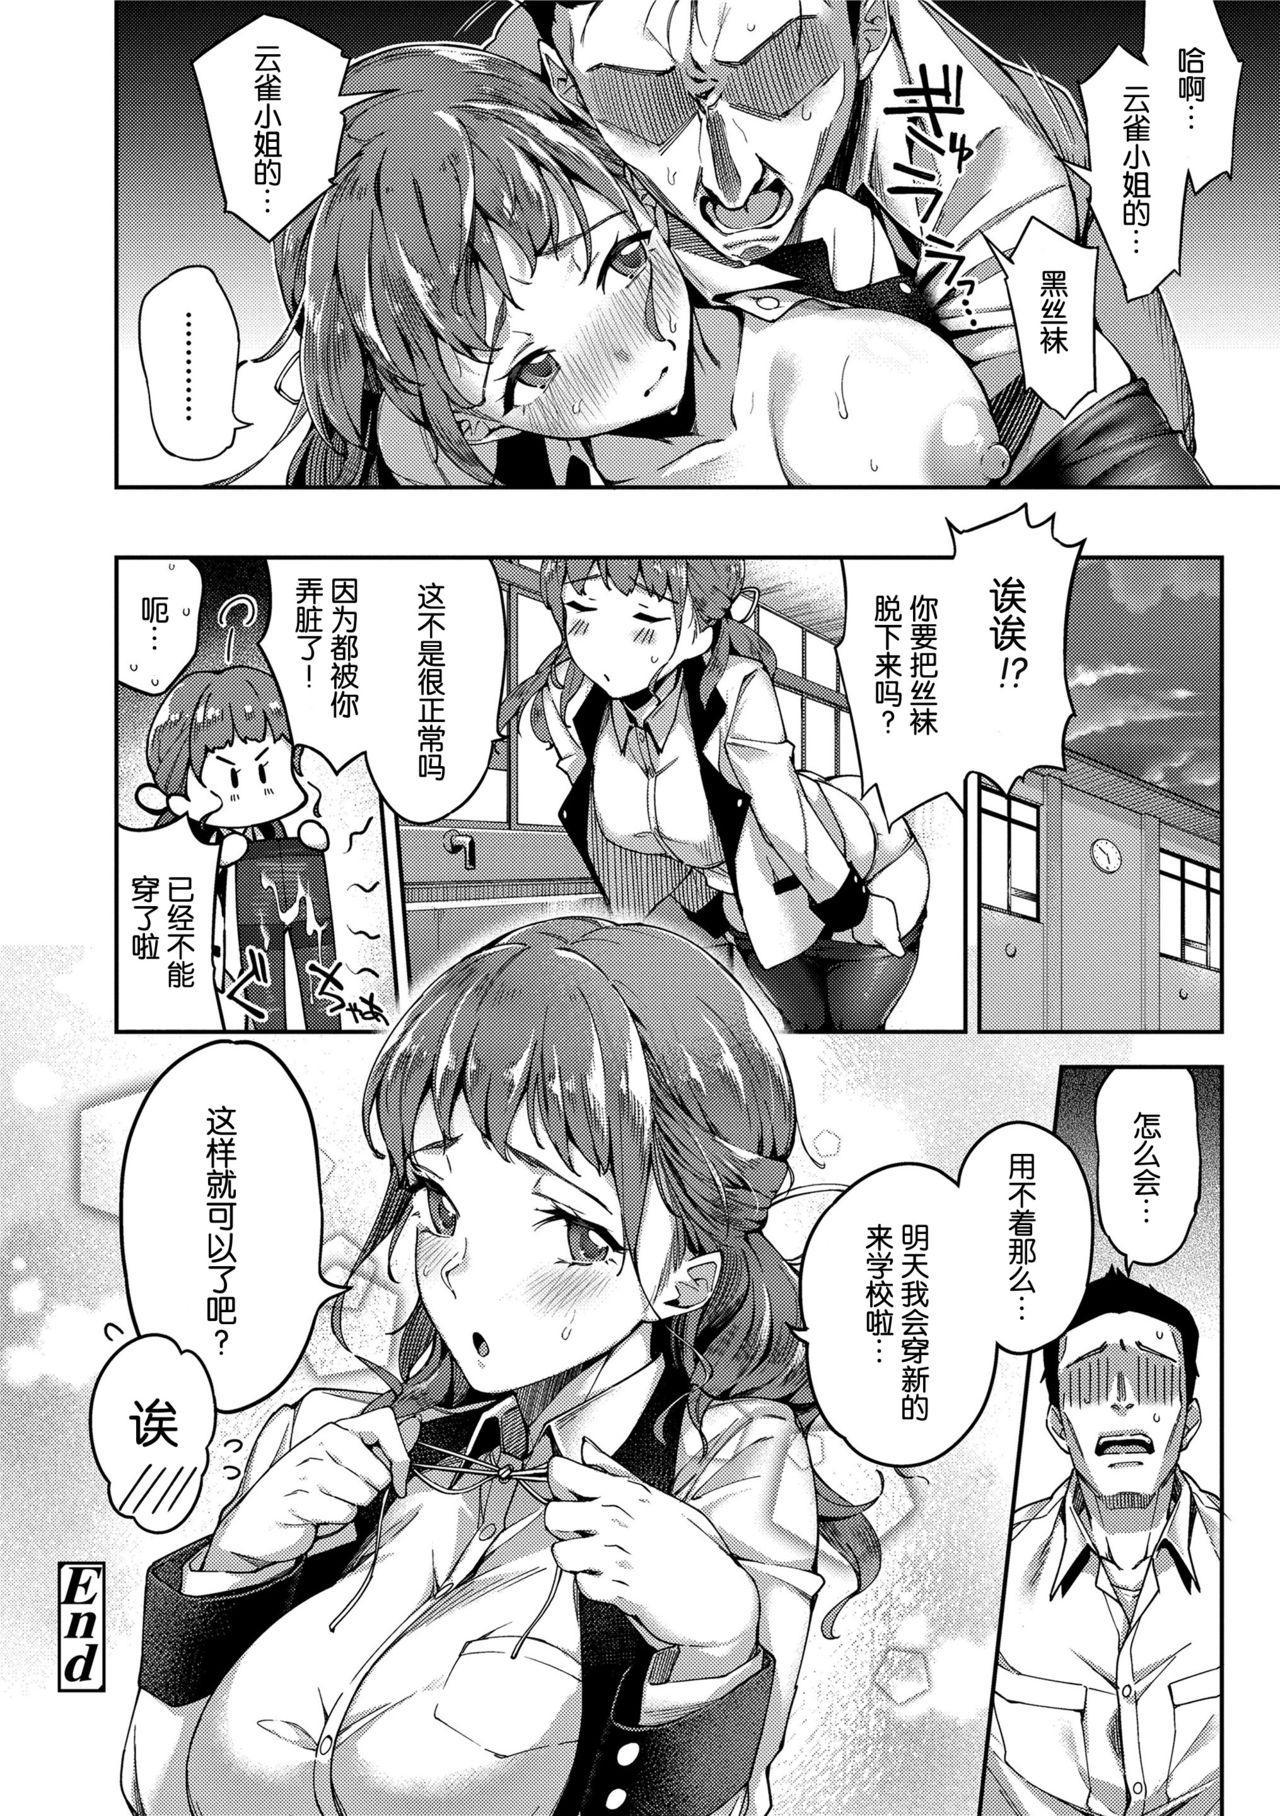 [sugarBt] Ai ga Nakutemo Ecchi wa Dekiru! - Even if There is No Love You Can H! Ch. 1-2 [Chinese] [Decensored] 19